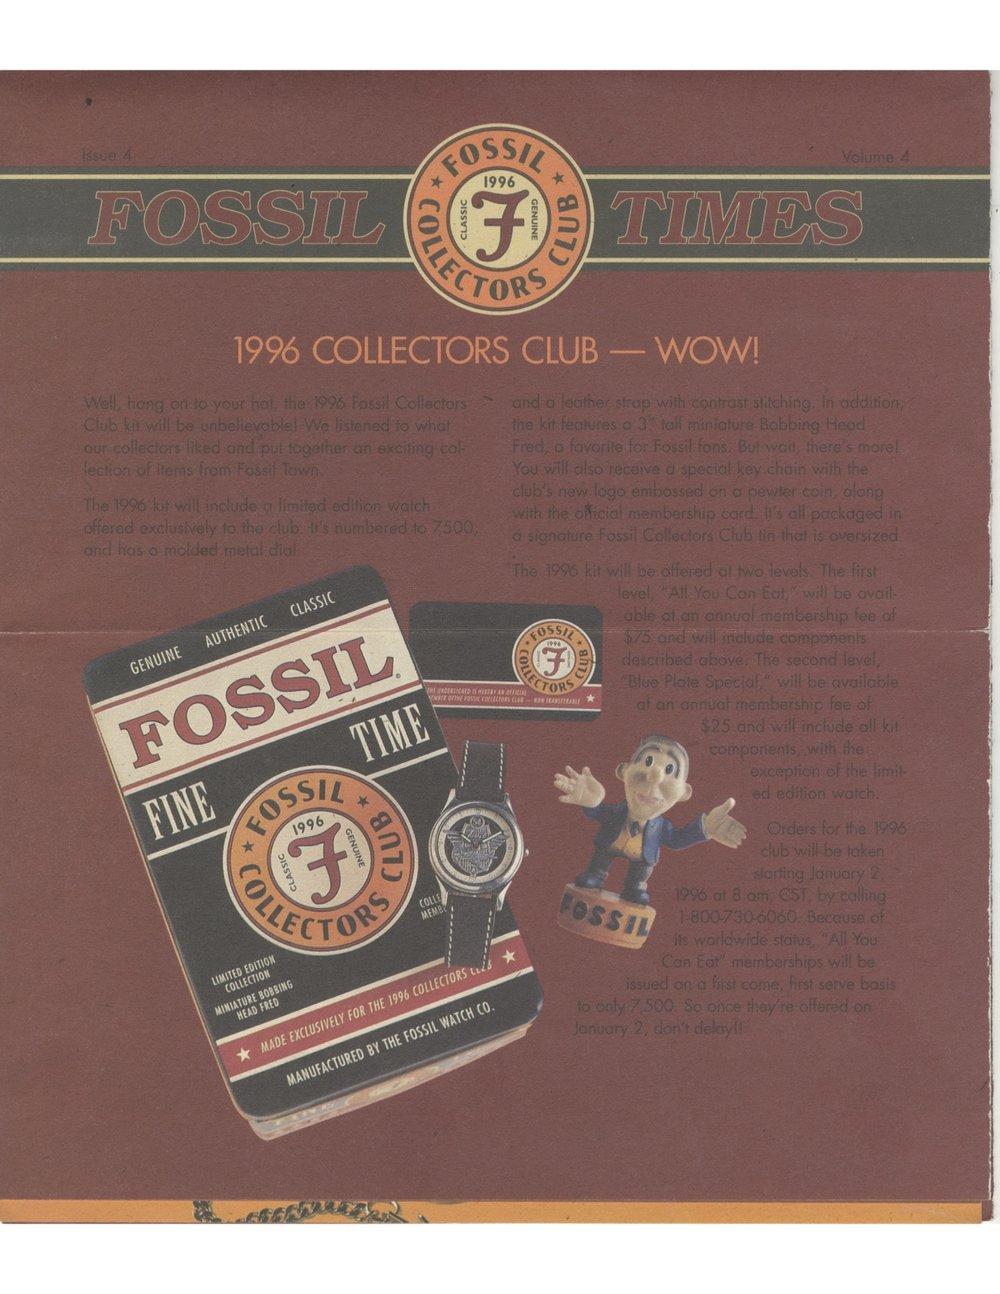 _1996_FossilTimes_V3_1_cover.jpg